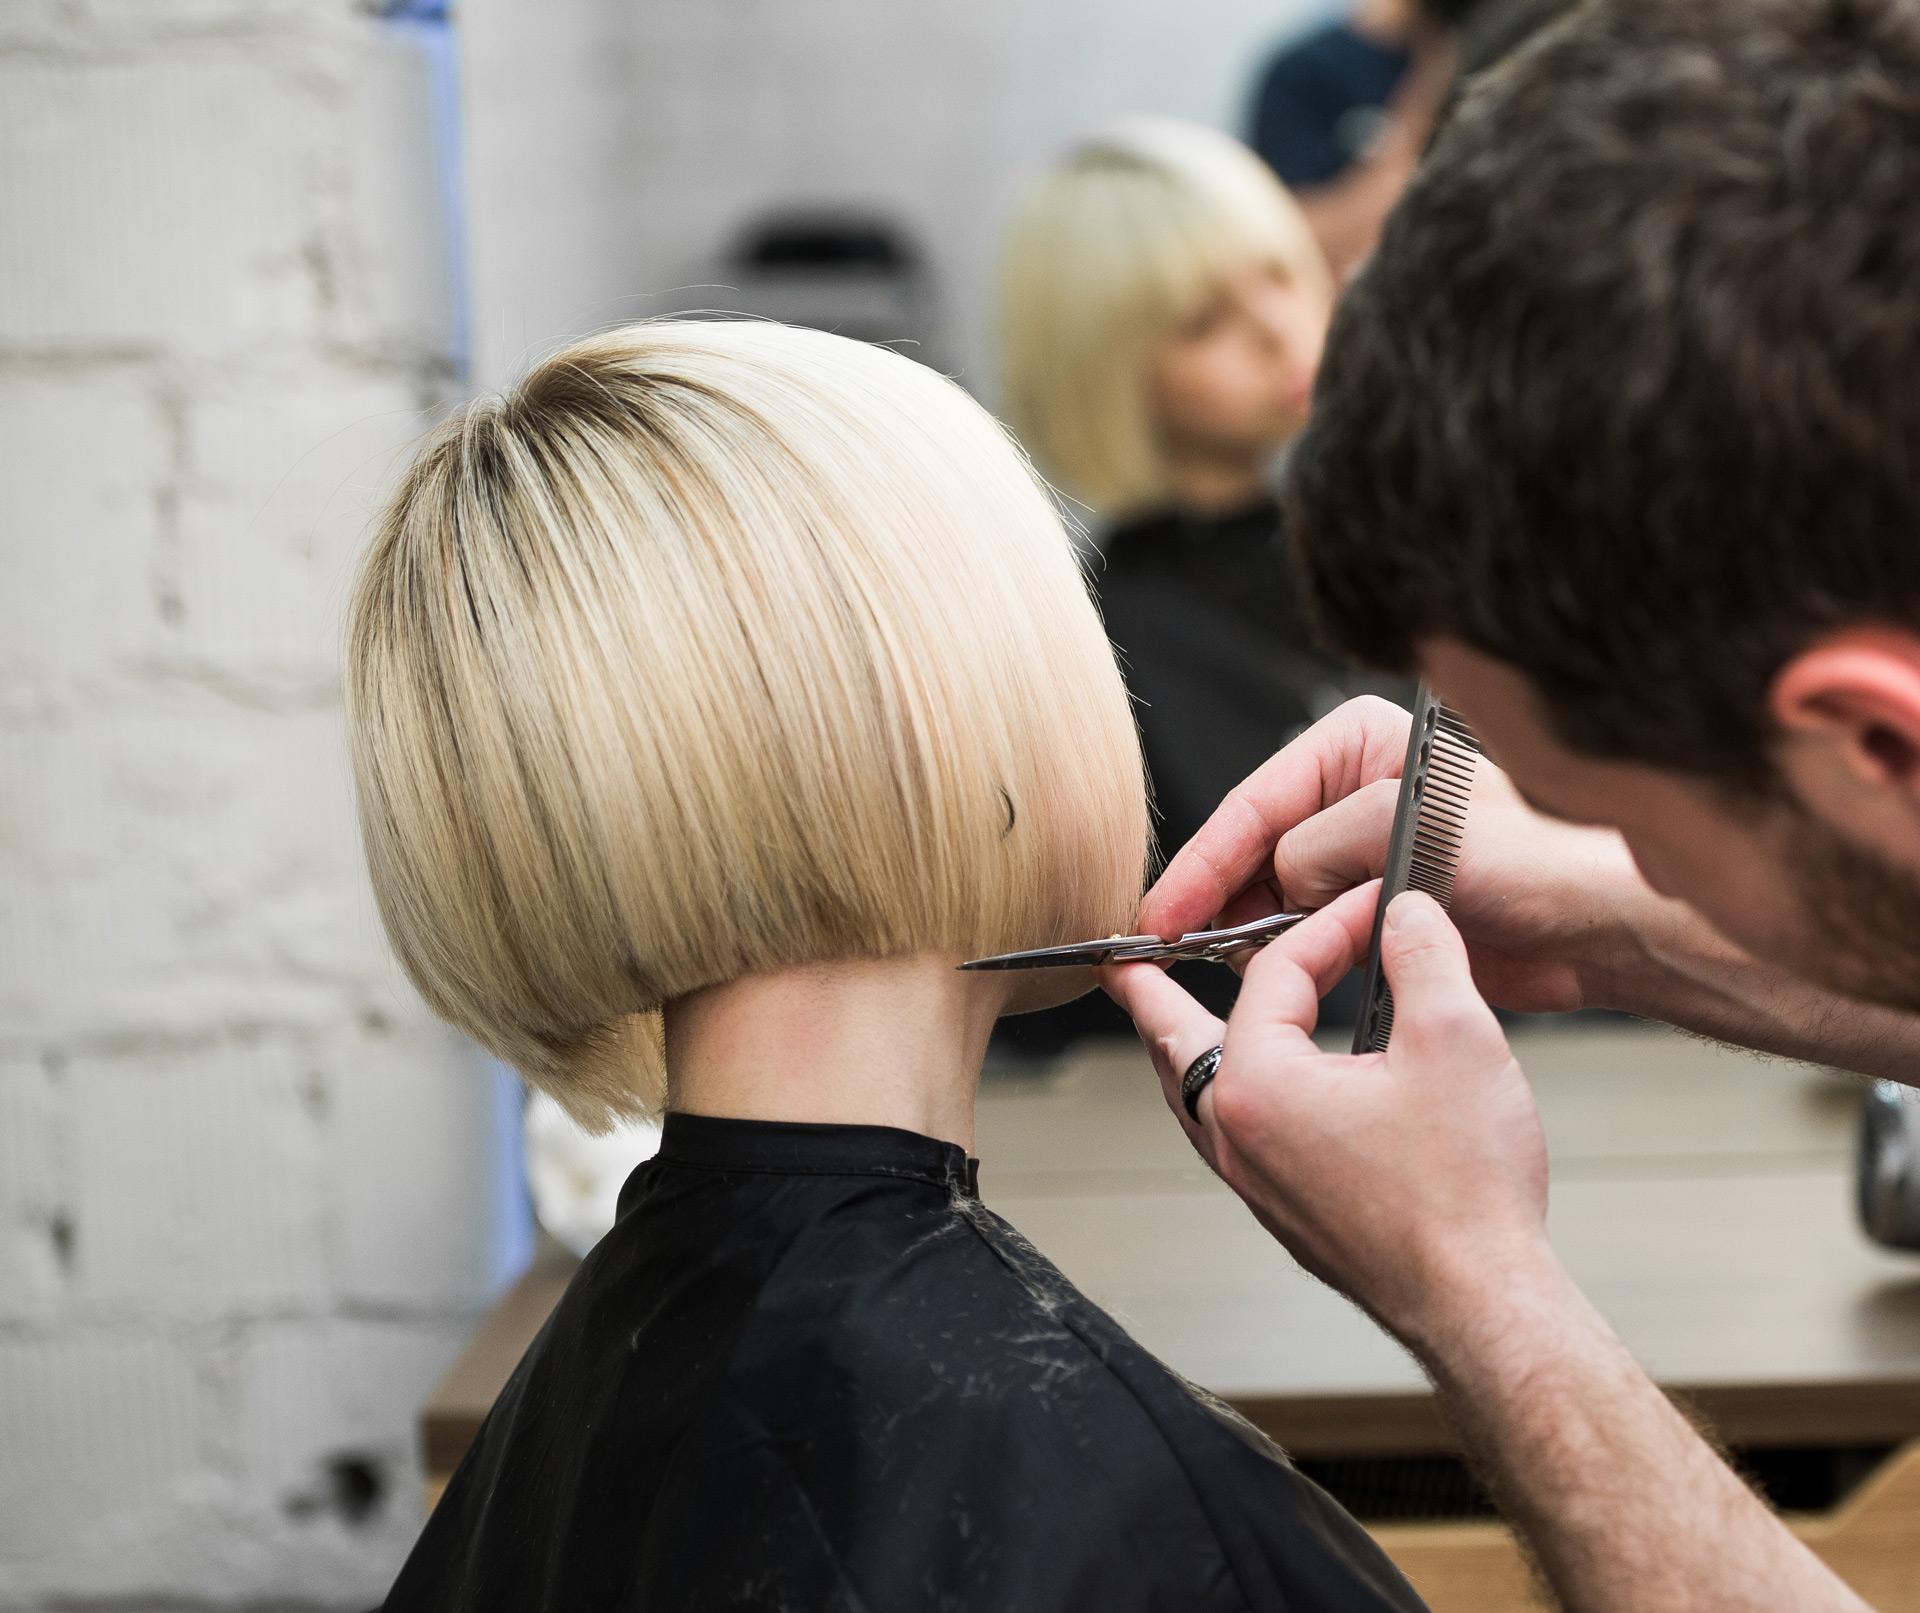 Woman gettting stylish haircut